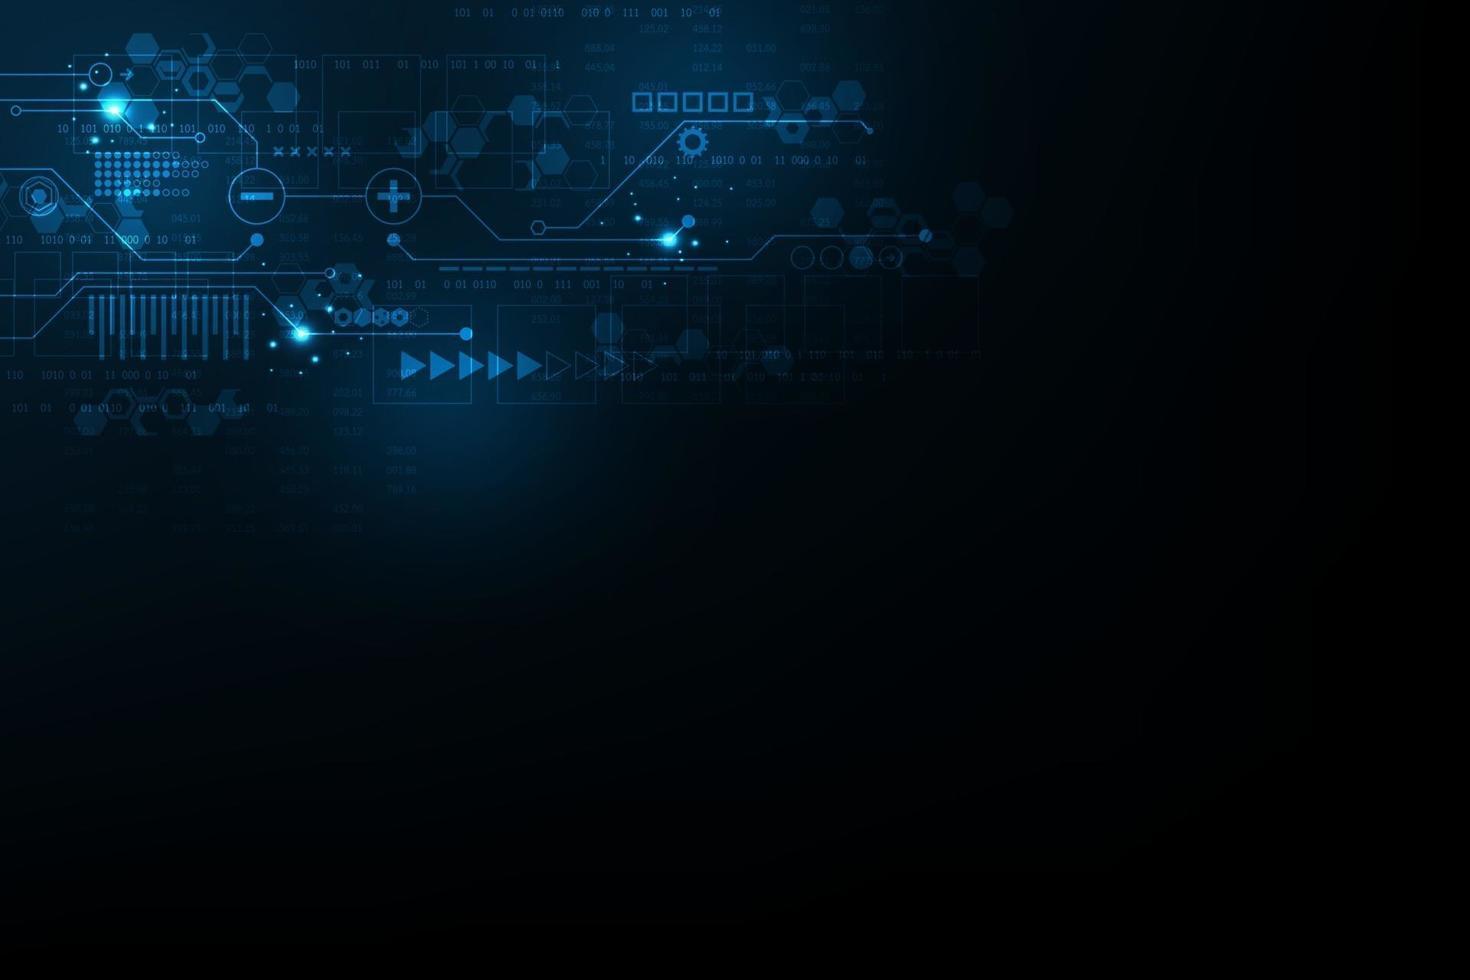 vetor abstrato sobre trabalho digital complexo.